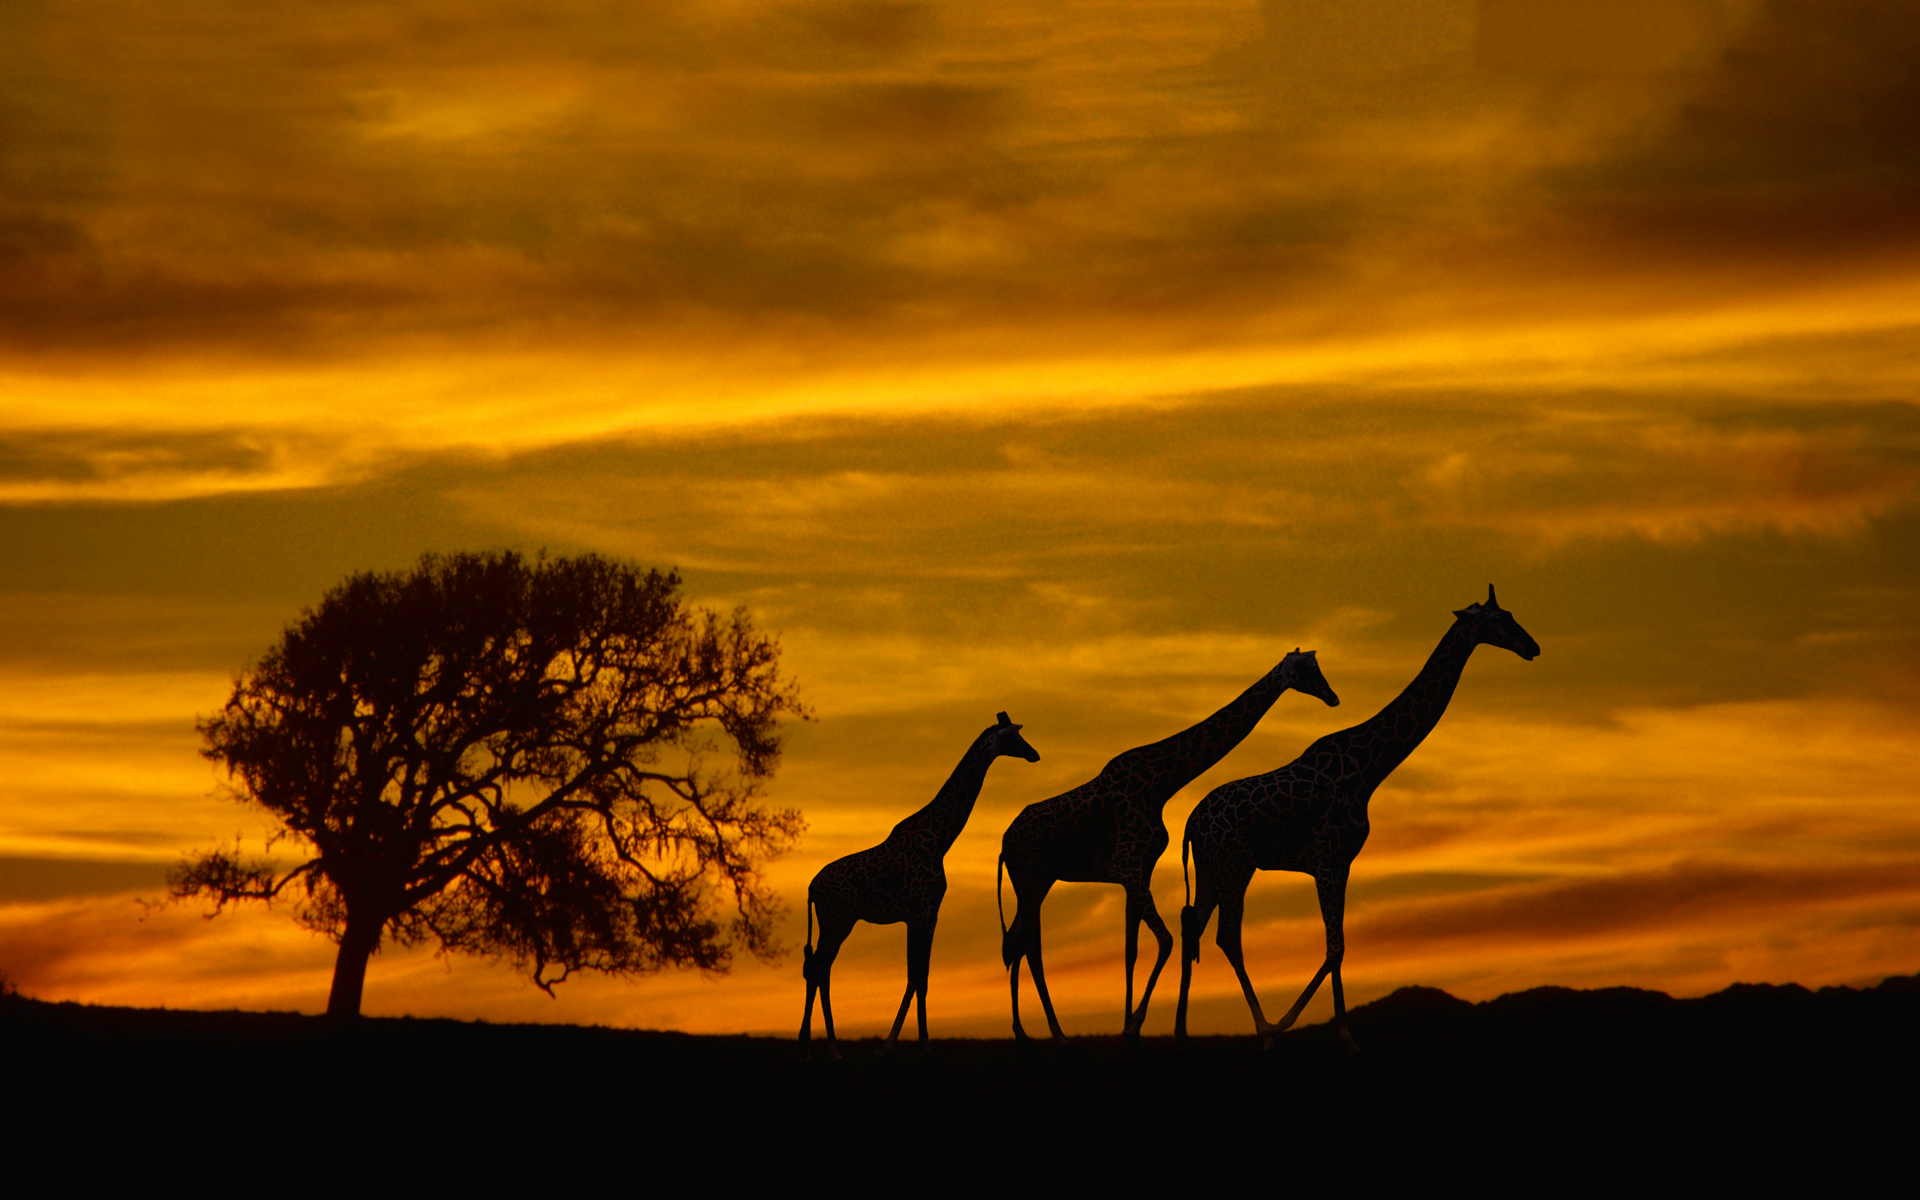 Giraffes silhouette